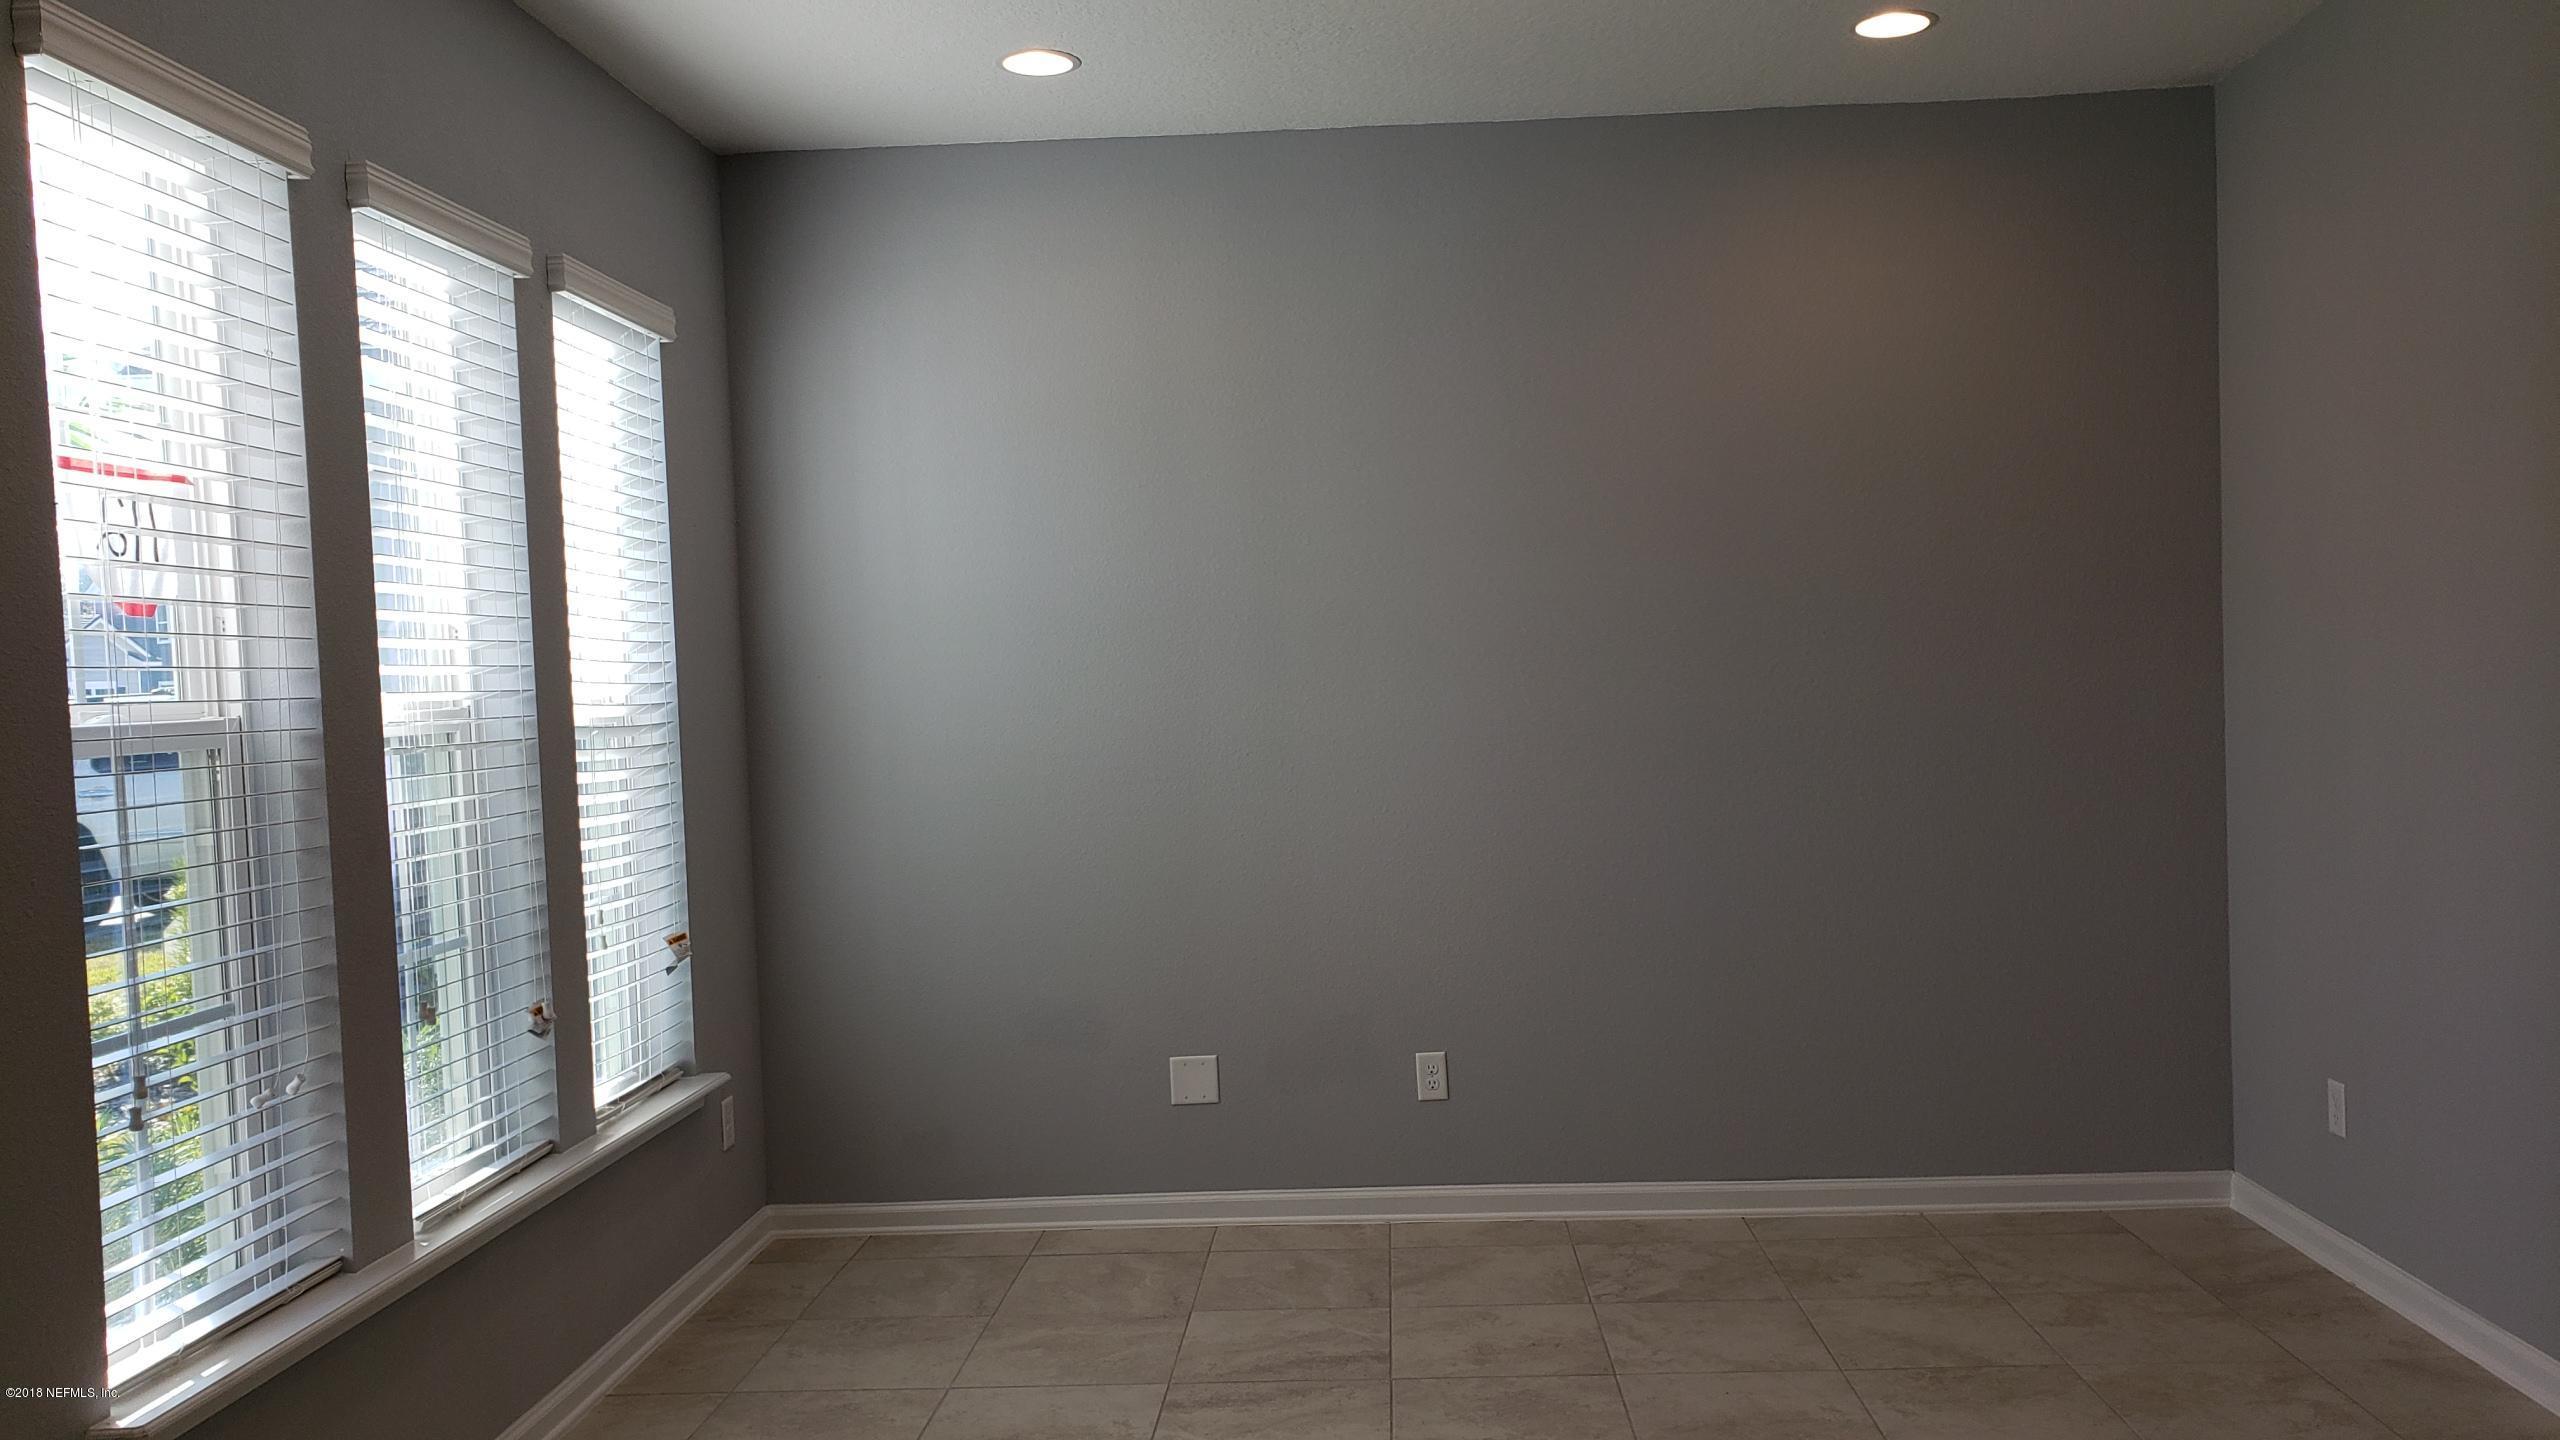 97211 HARBOR CONCOURSE, FERNANDINA BEACH, FLORIDA 32034, 3 Bedrooms Bedrooms, ,3 BathroomsBathrooms,Residential - single family,For sale,HARBOR CONCOURSE,953505